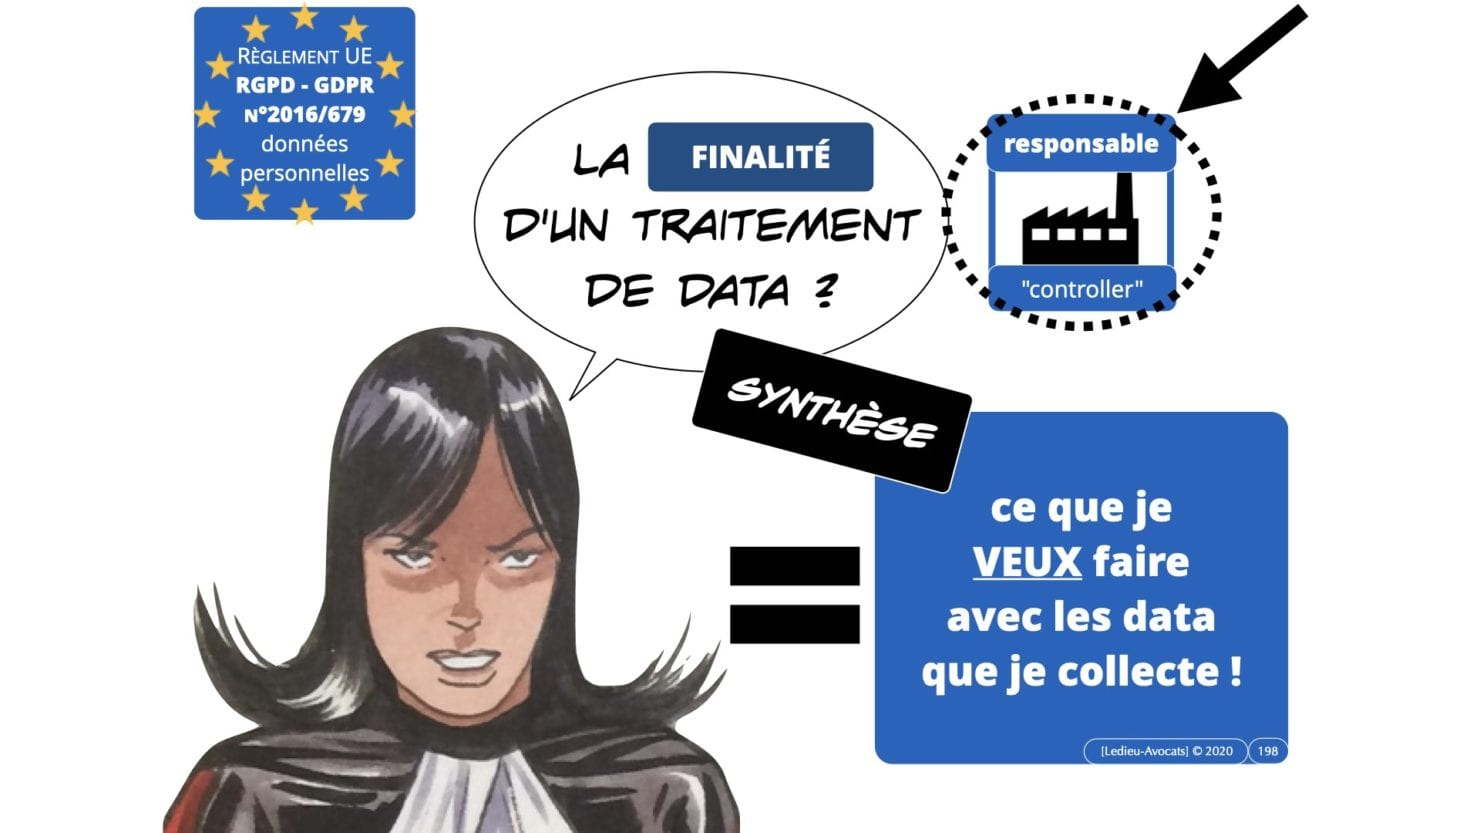 RGPD e-Privacy principes actualité jurisprudence ©Ledieu-Avocats 25-06-2021.198